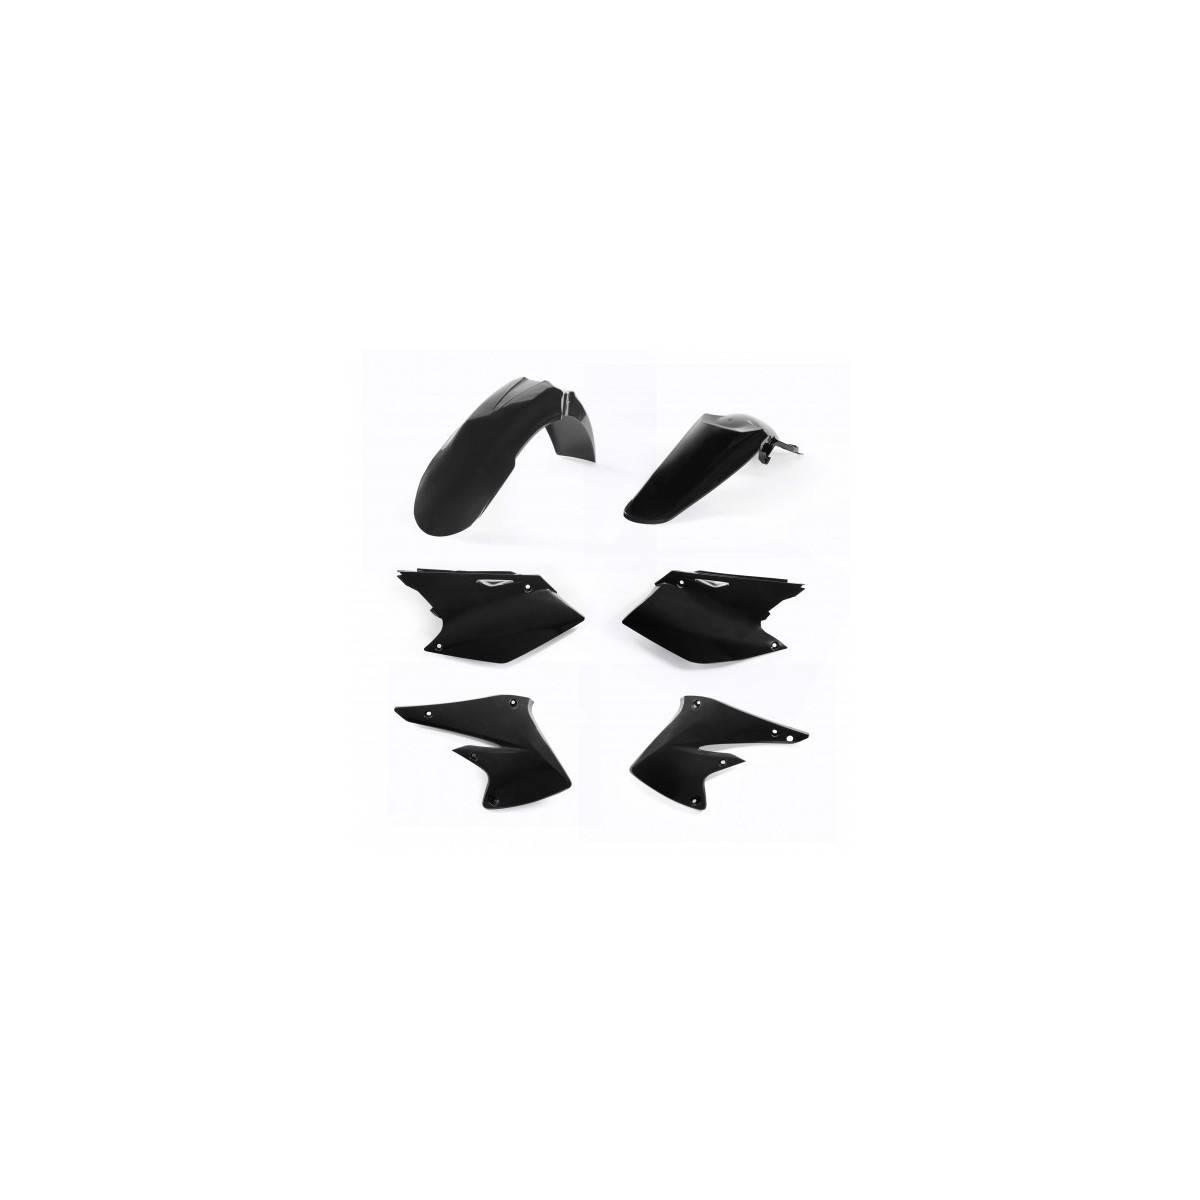 0013776-090 - Kit Plasticos Rmz 250 10 17 Negro